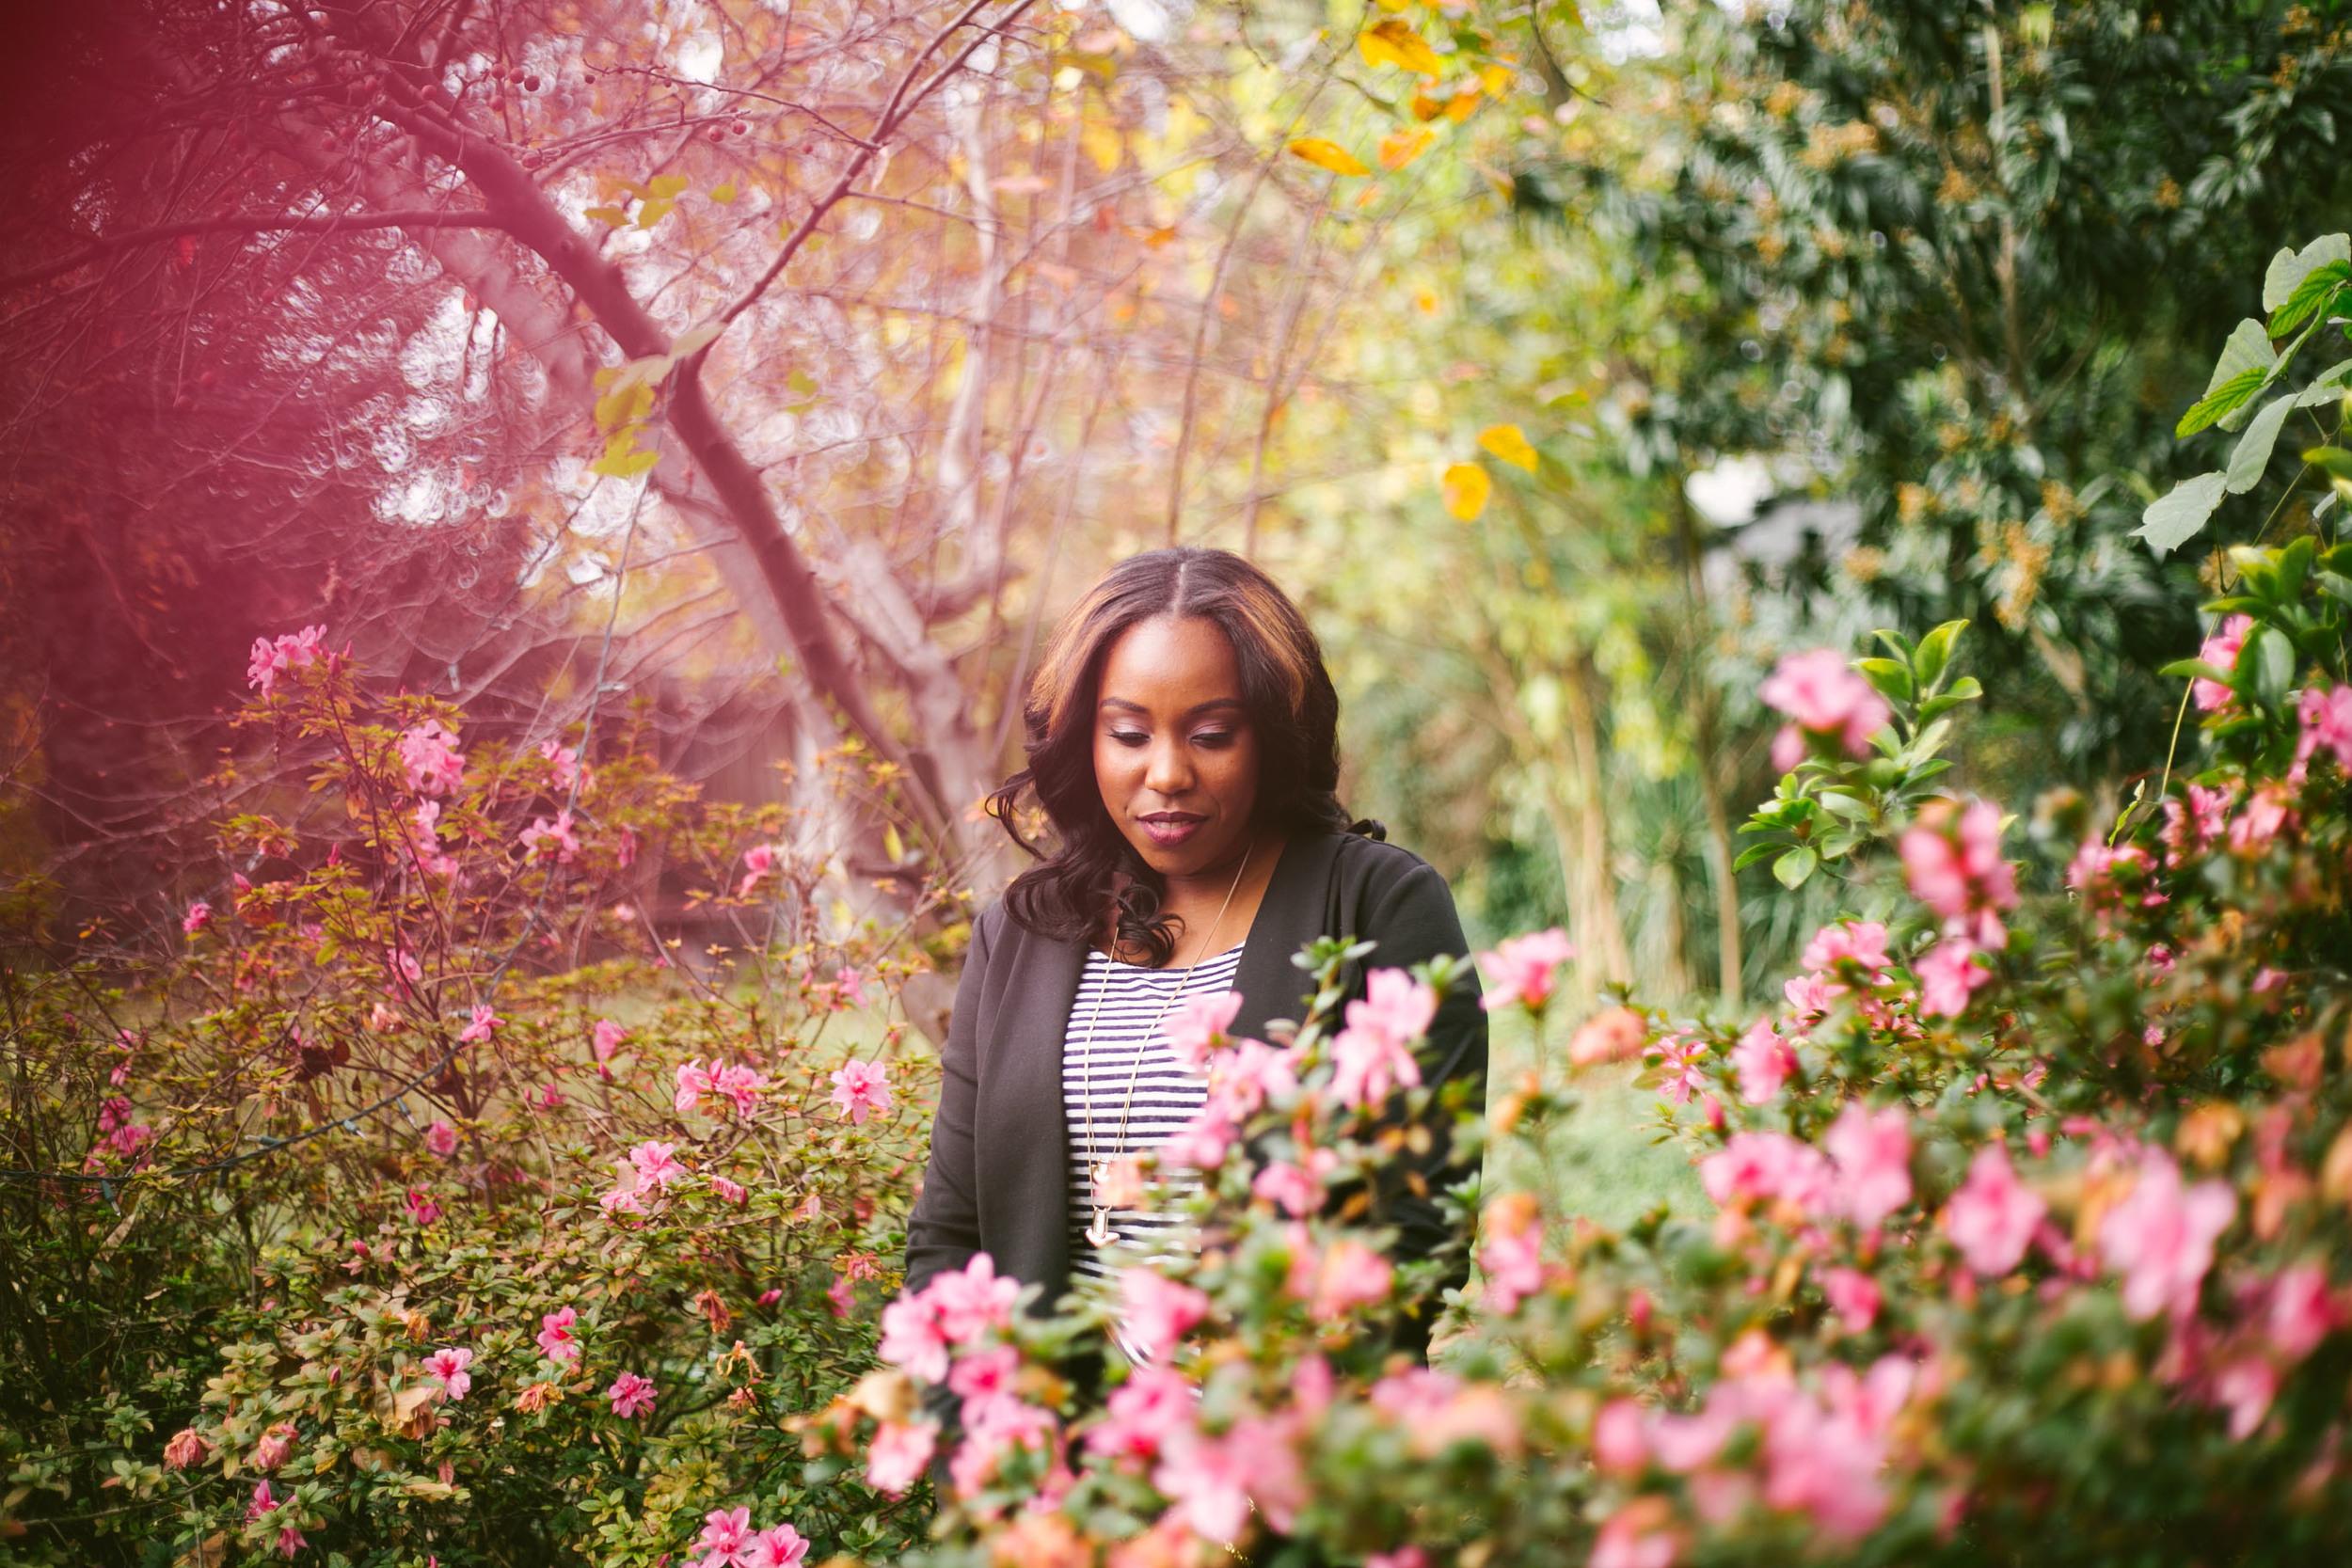 Kiyah C Photography-Atlanta Lifestyle Photographer-Renee-1851.jpg